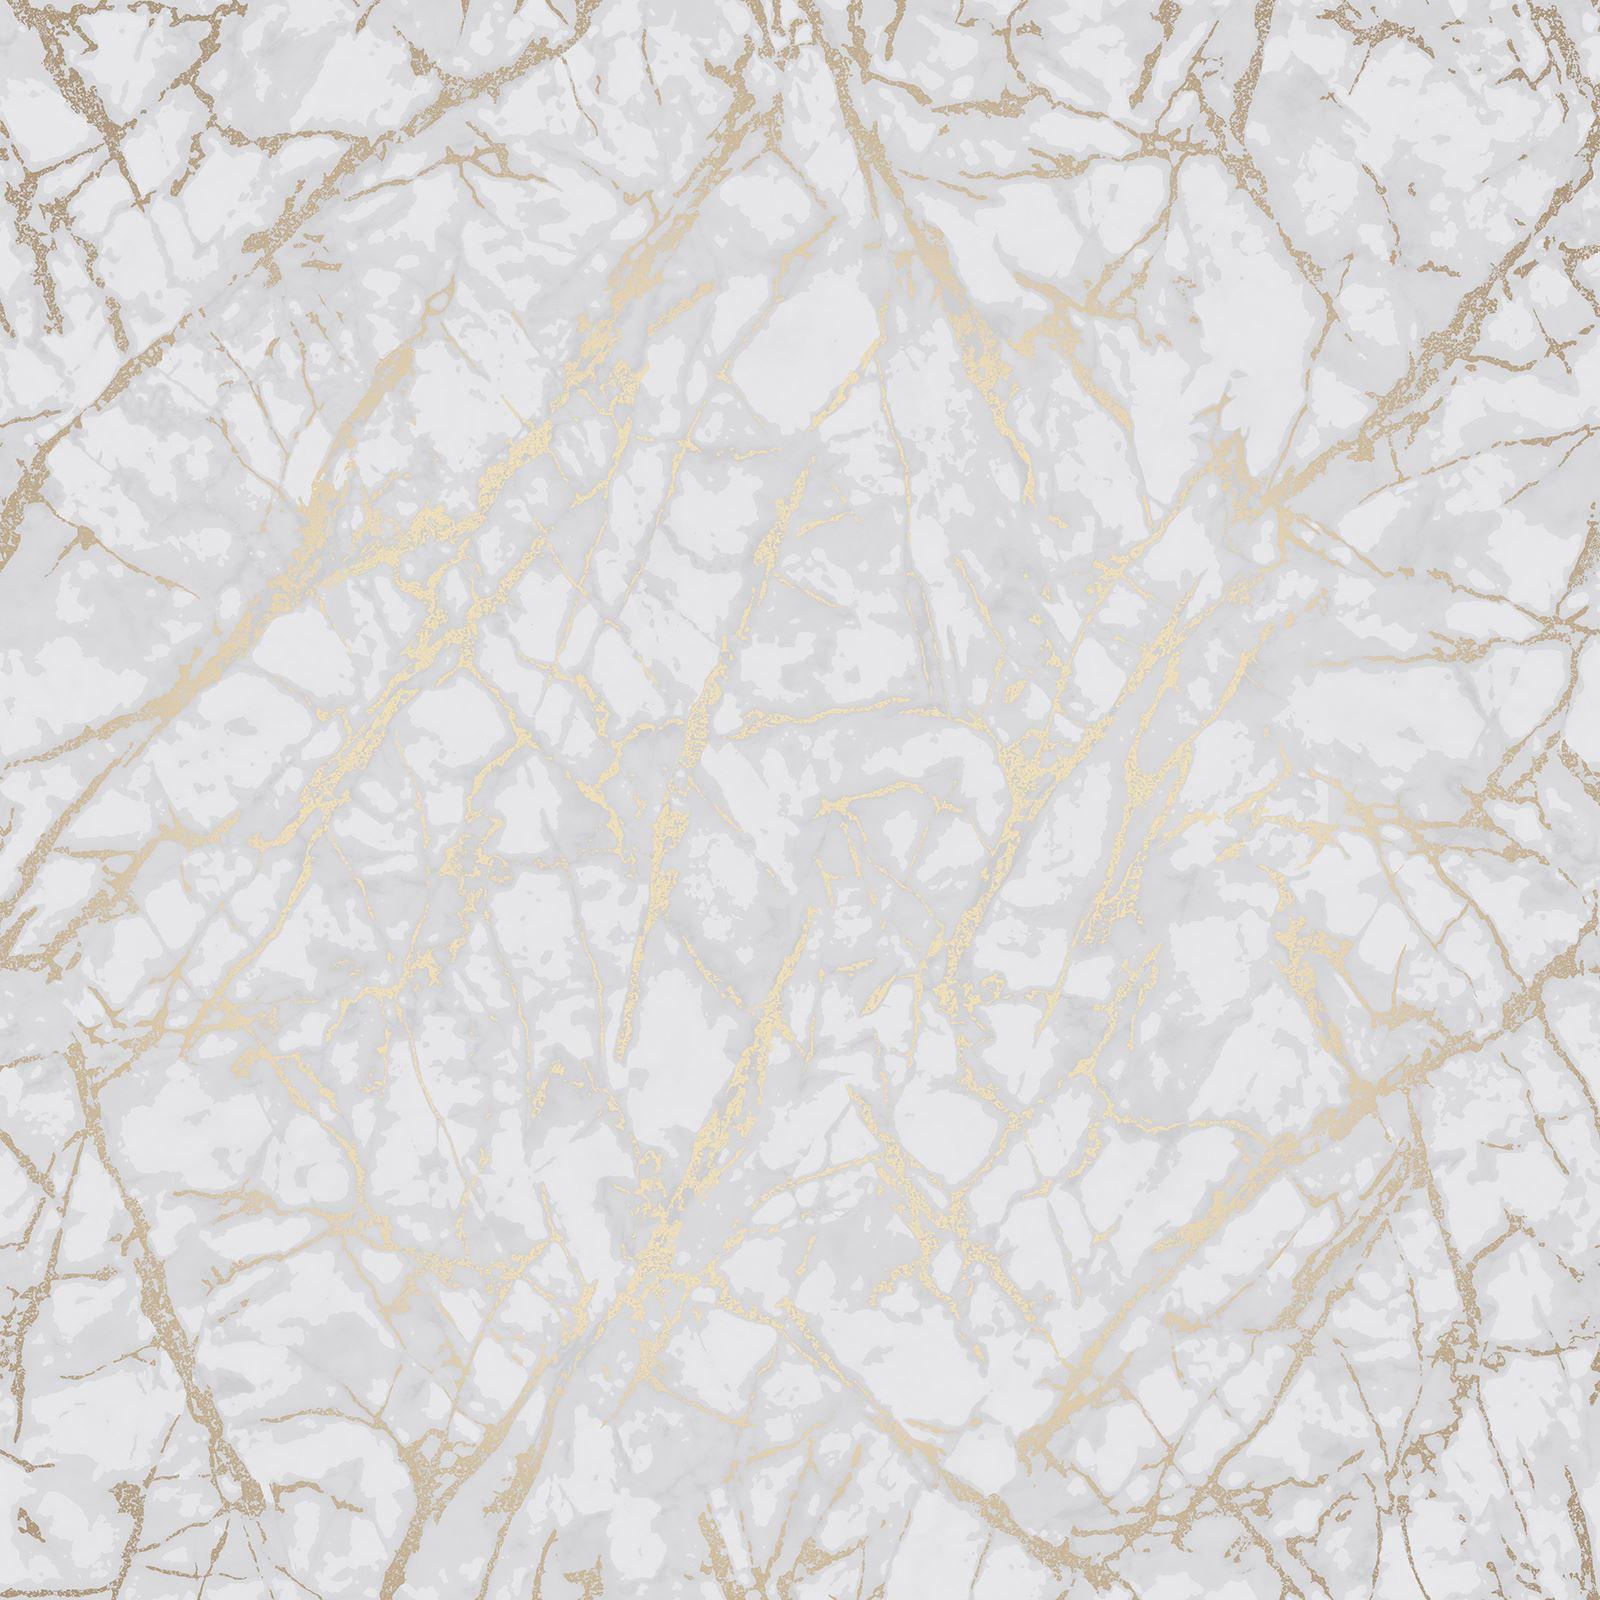 fine decor metallic geometric plain marble wallpaper rose gold copper silver ebay. Black Bedroom Furniture Sets. Home Design Ideas